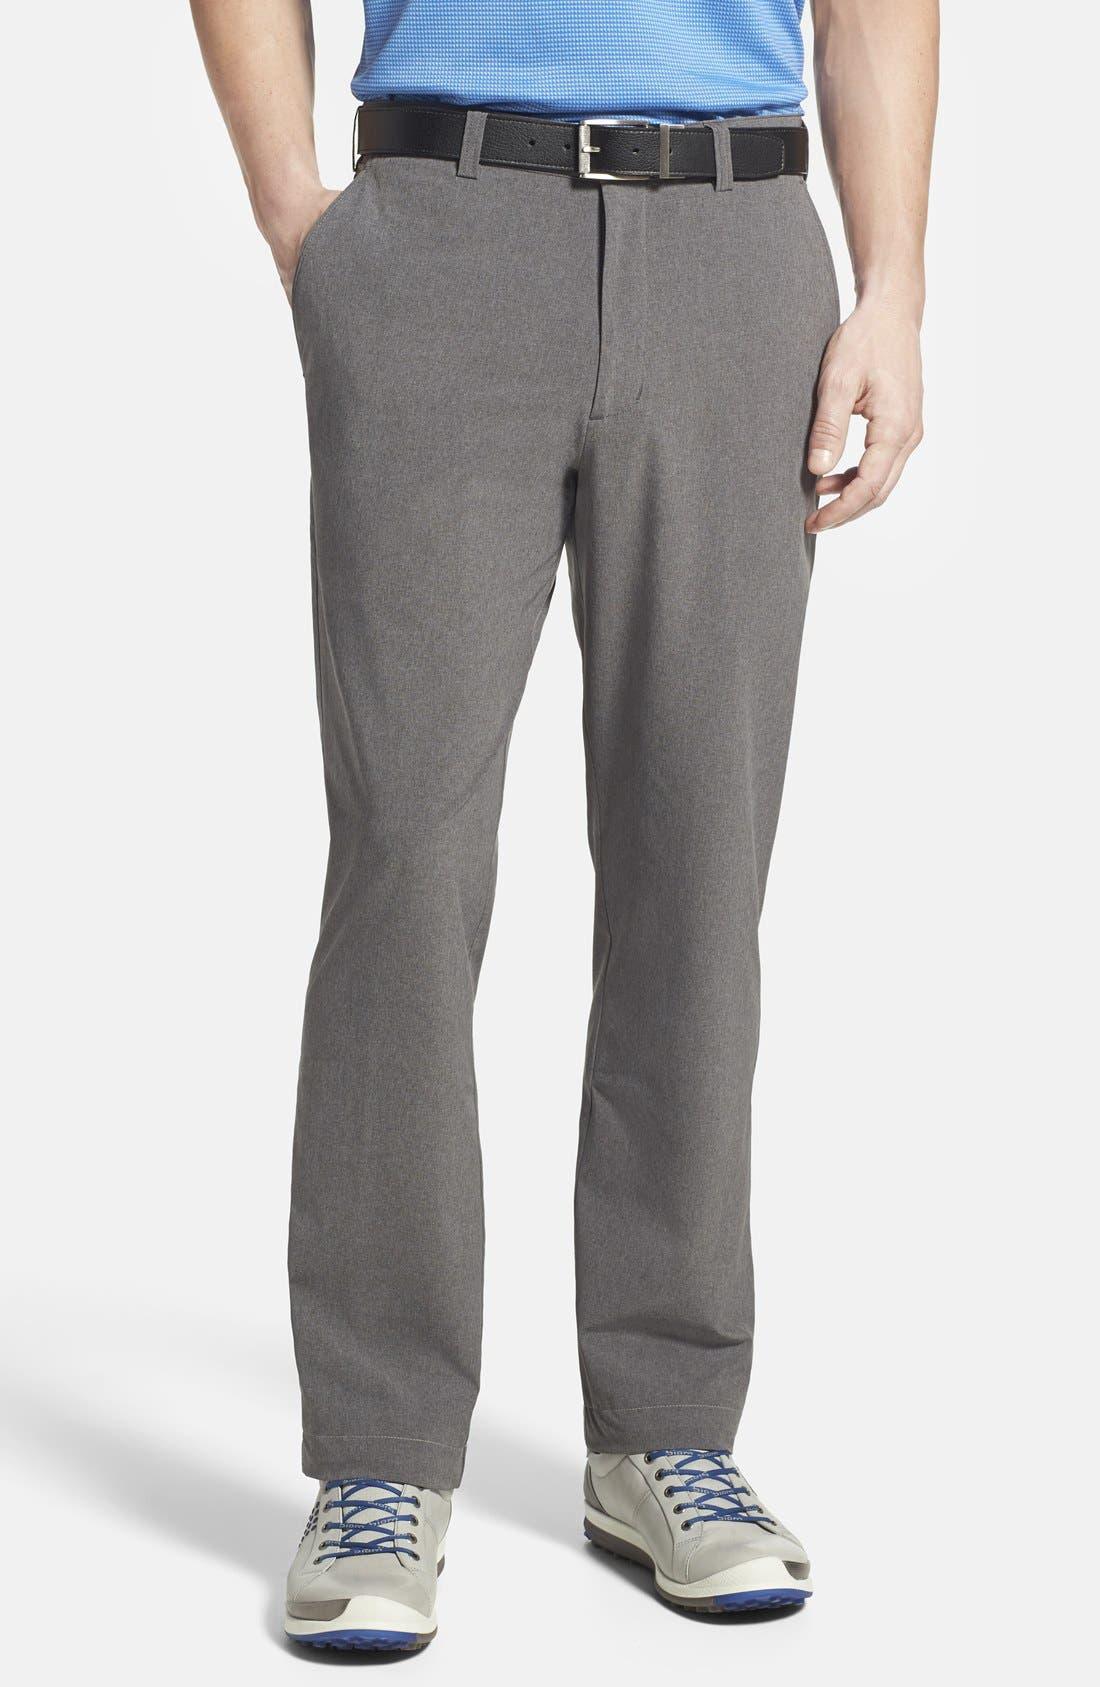 Bainbridge DryTec Moisture Wicking Flat Front Pants,                         Main,                         color, IRON GREY